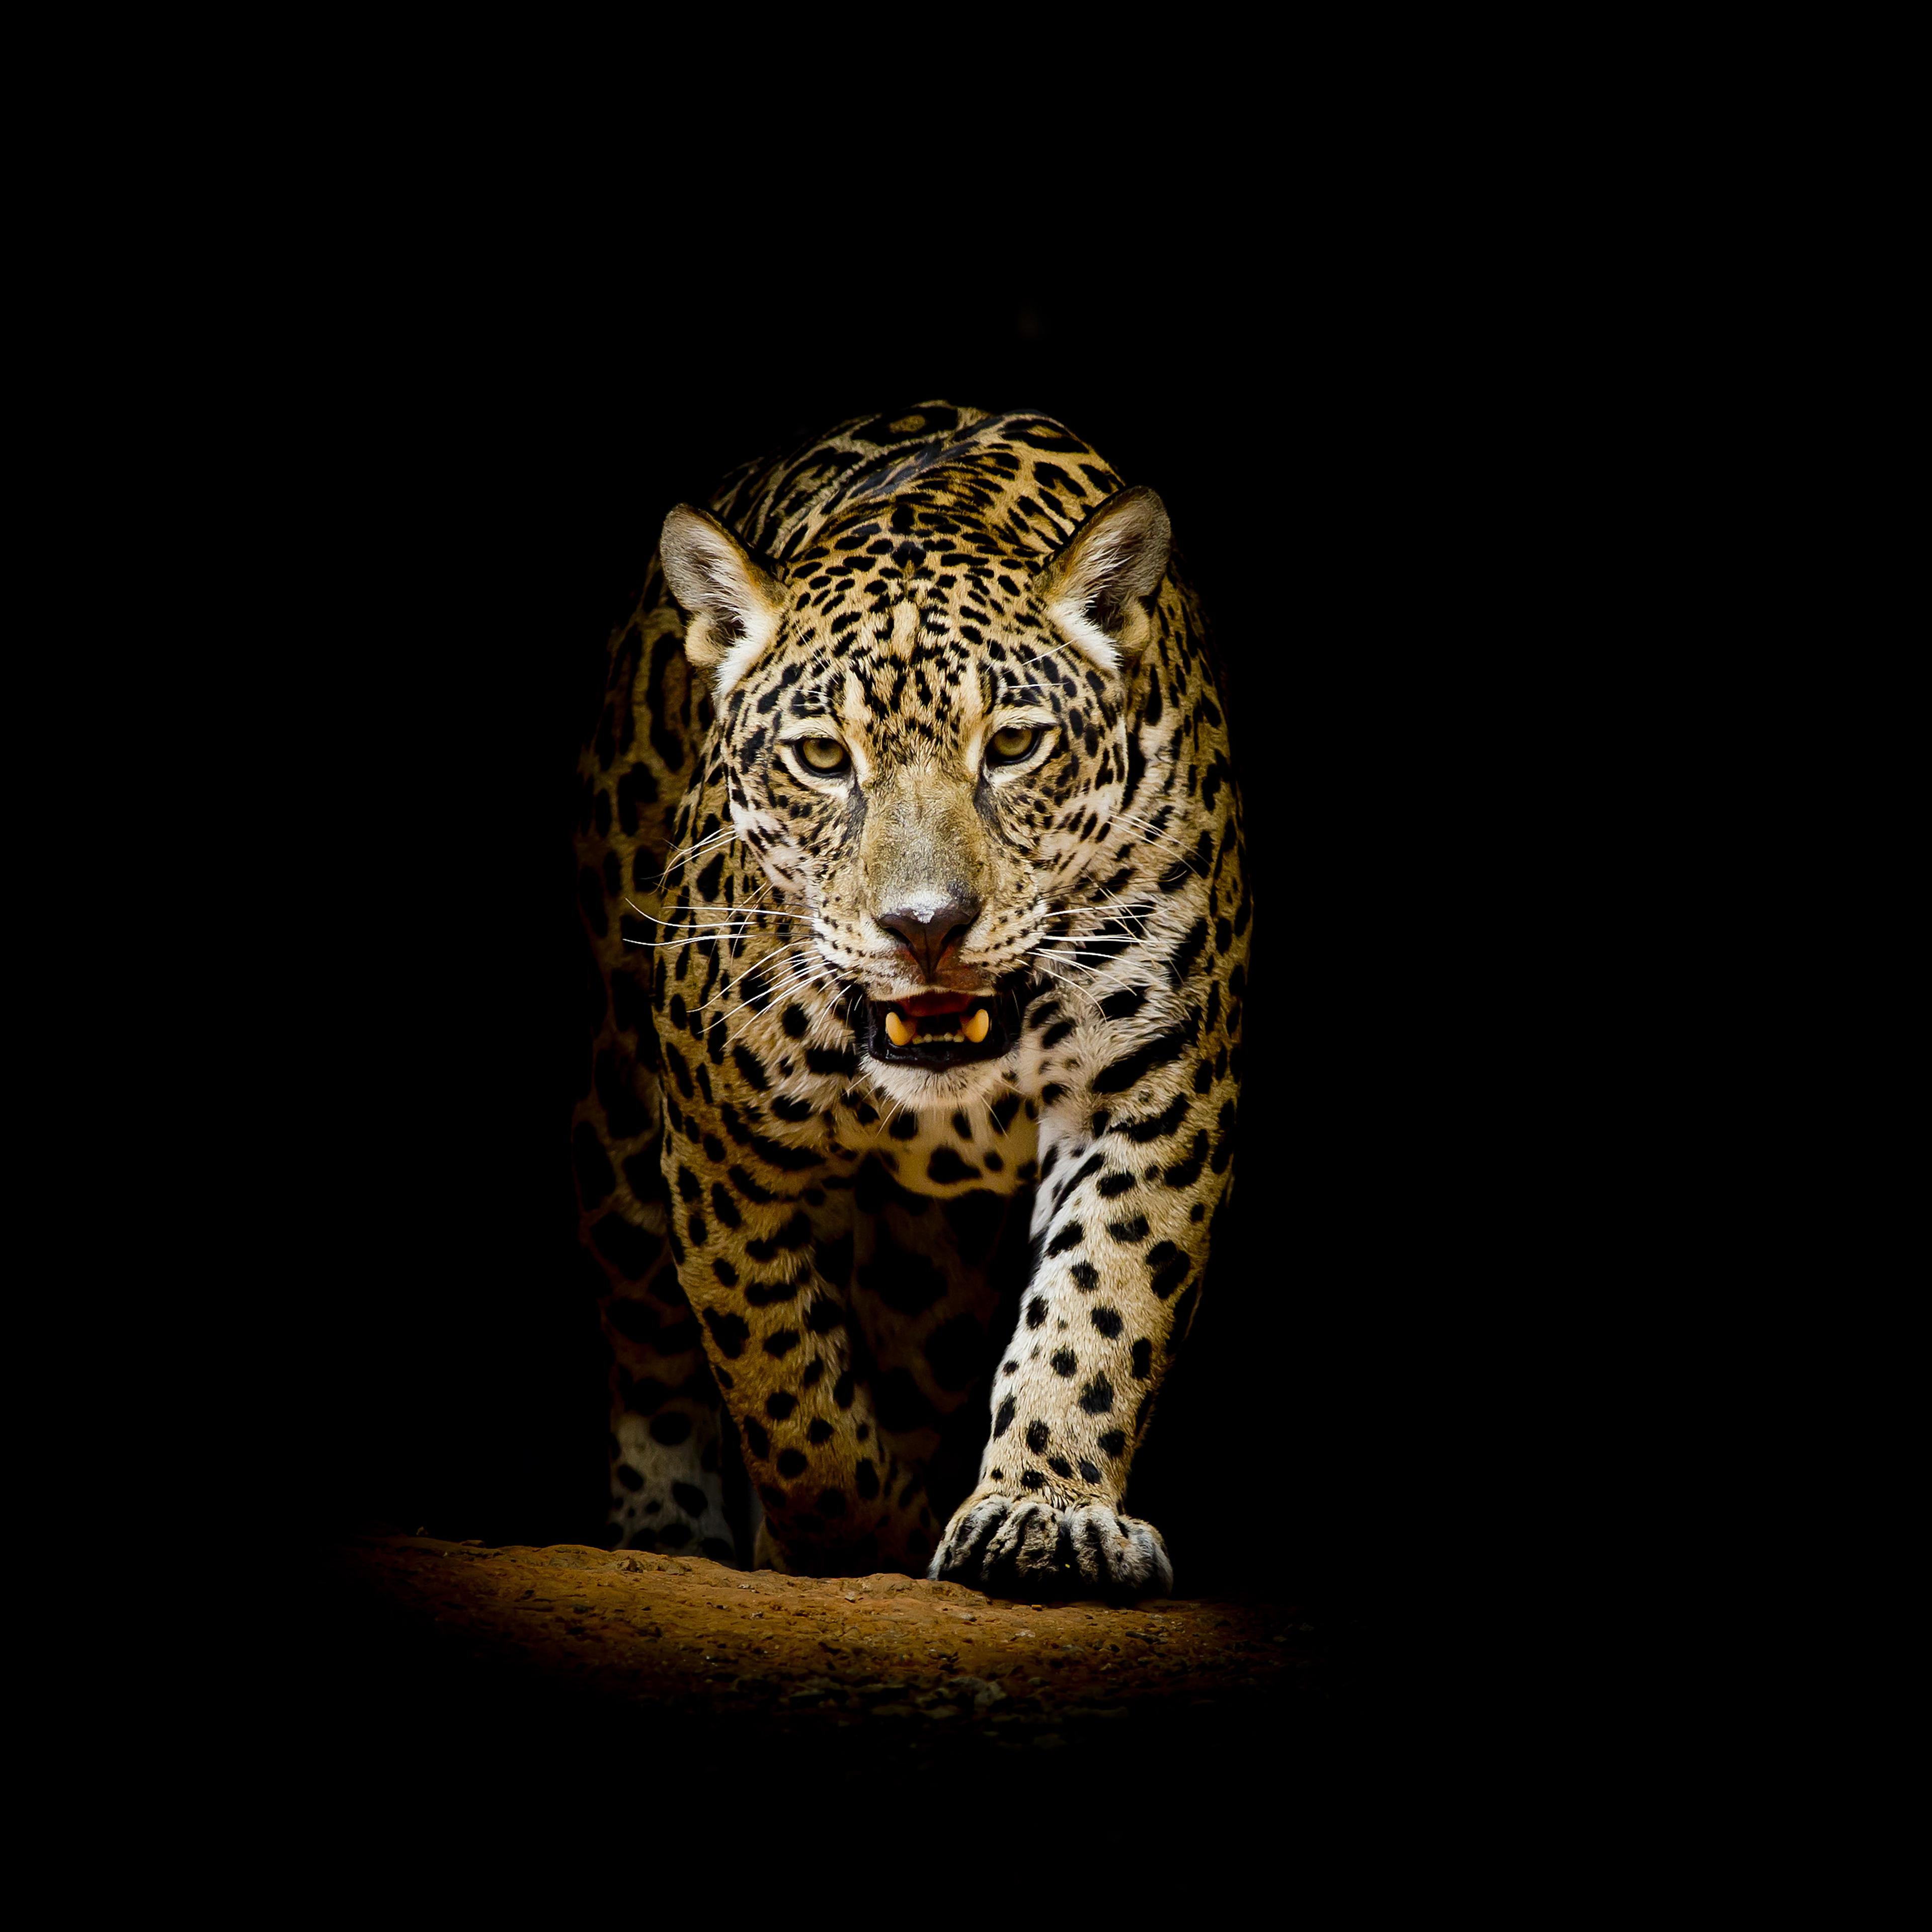 Leopard 4k Black Background, HD Animals, 4k Wallpapers ...